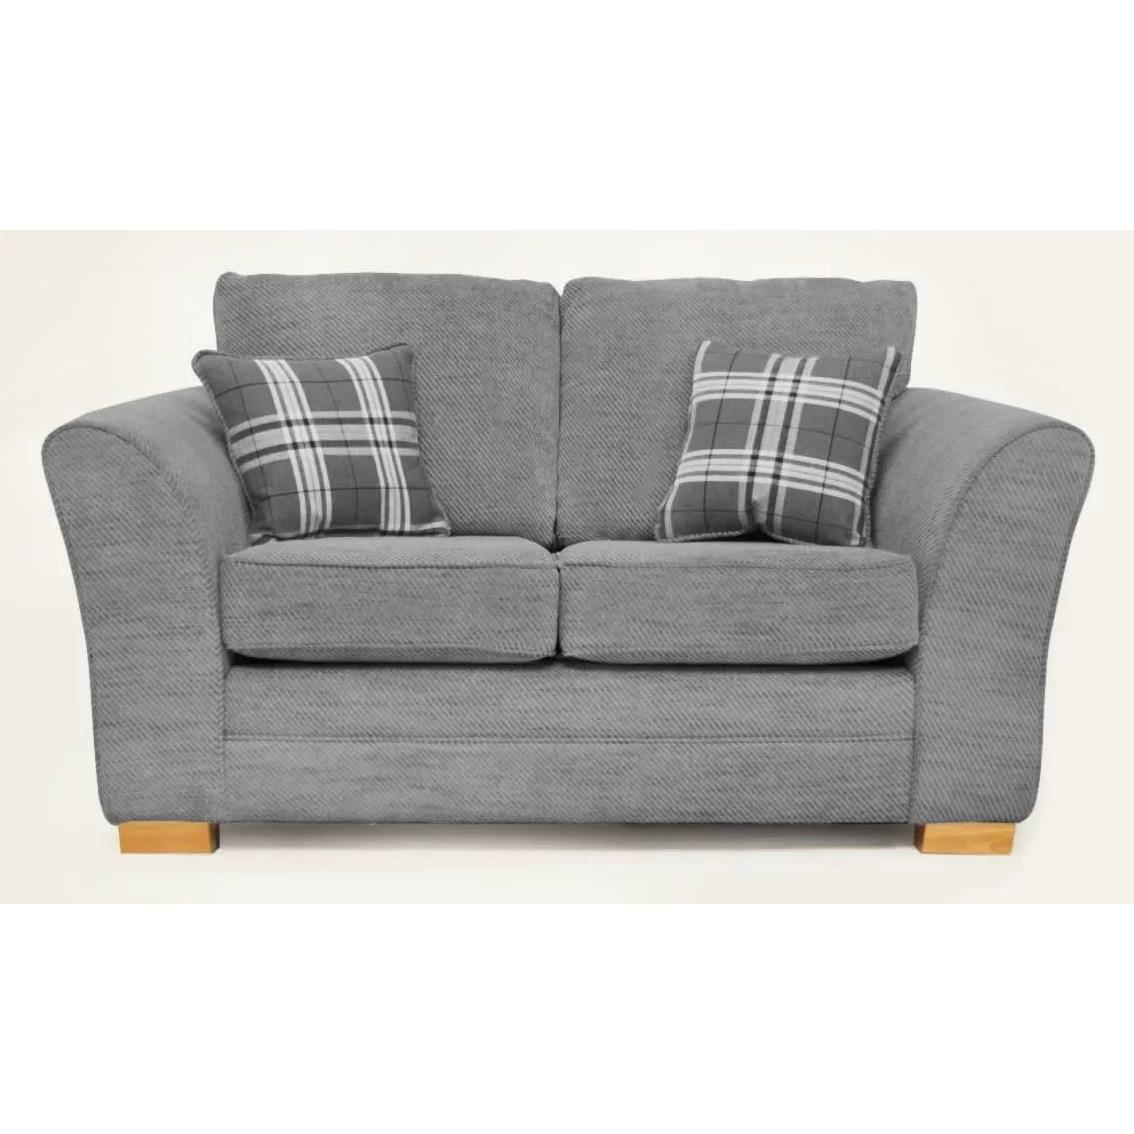 the sofa factory reviews leather studio aprilia 2 seater and wayfair uk